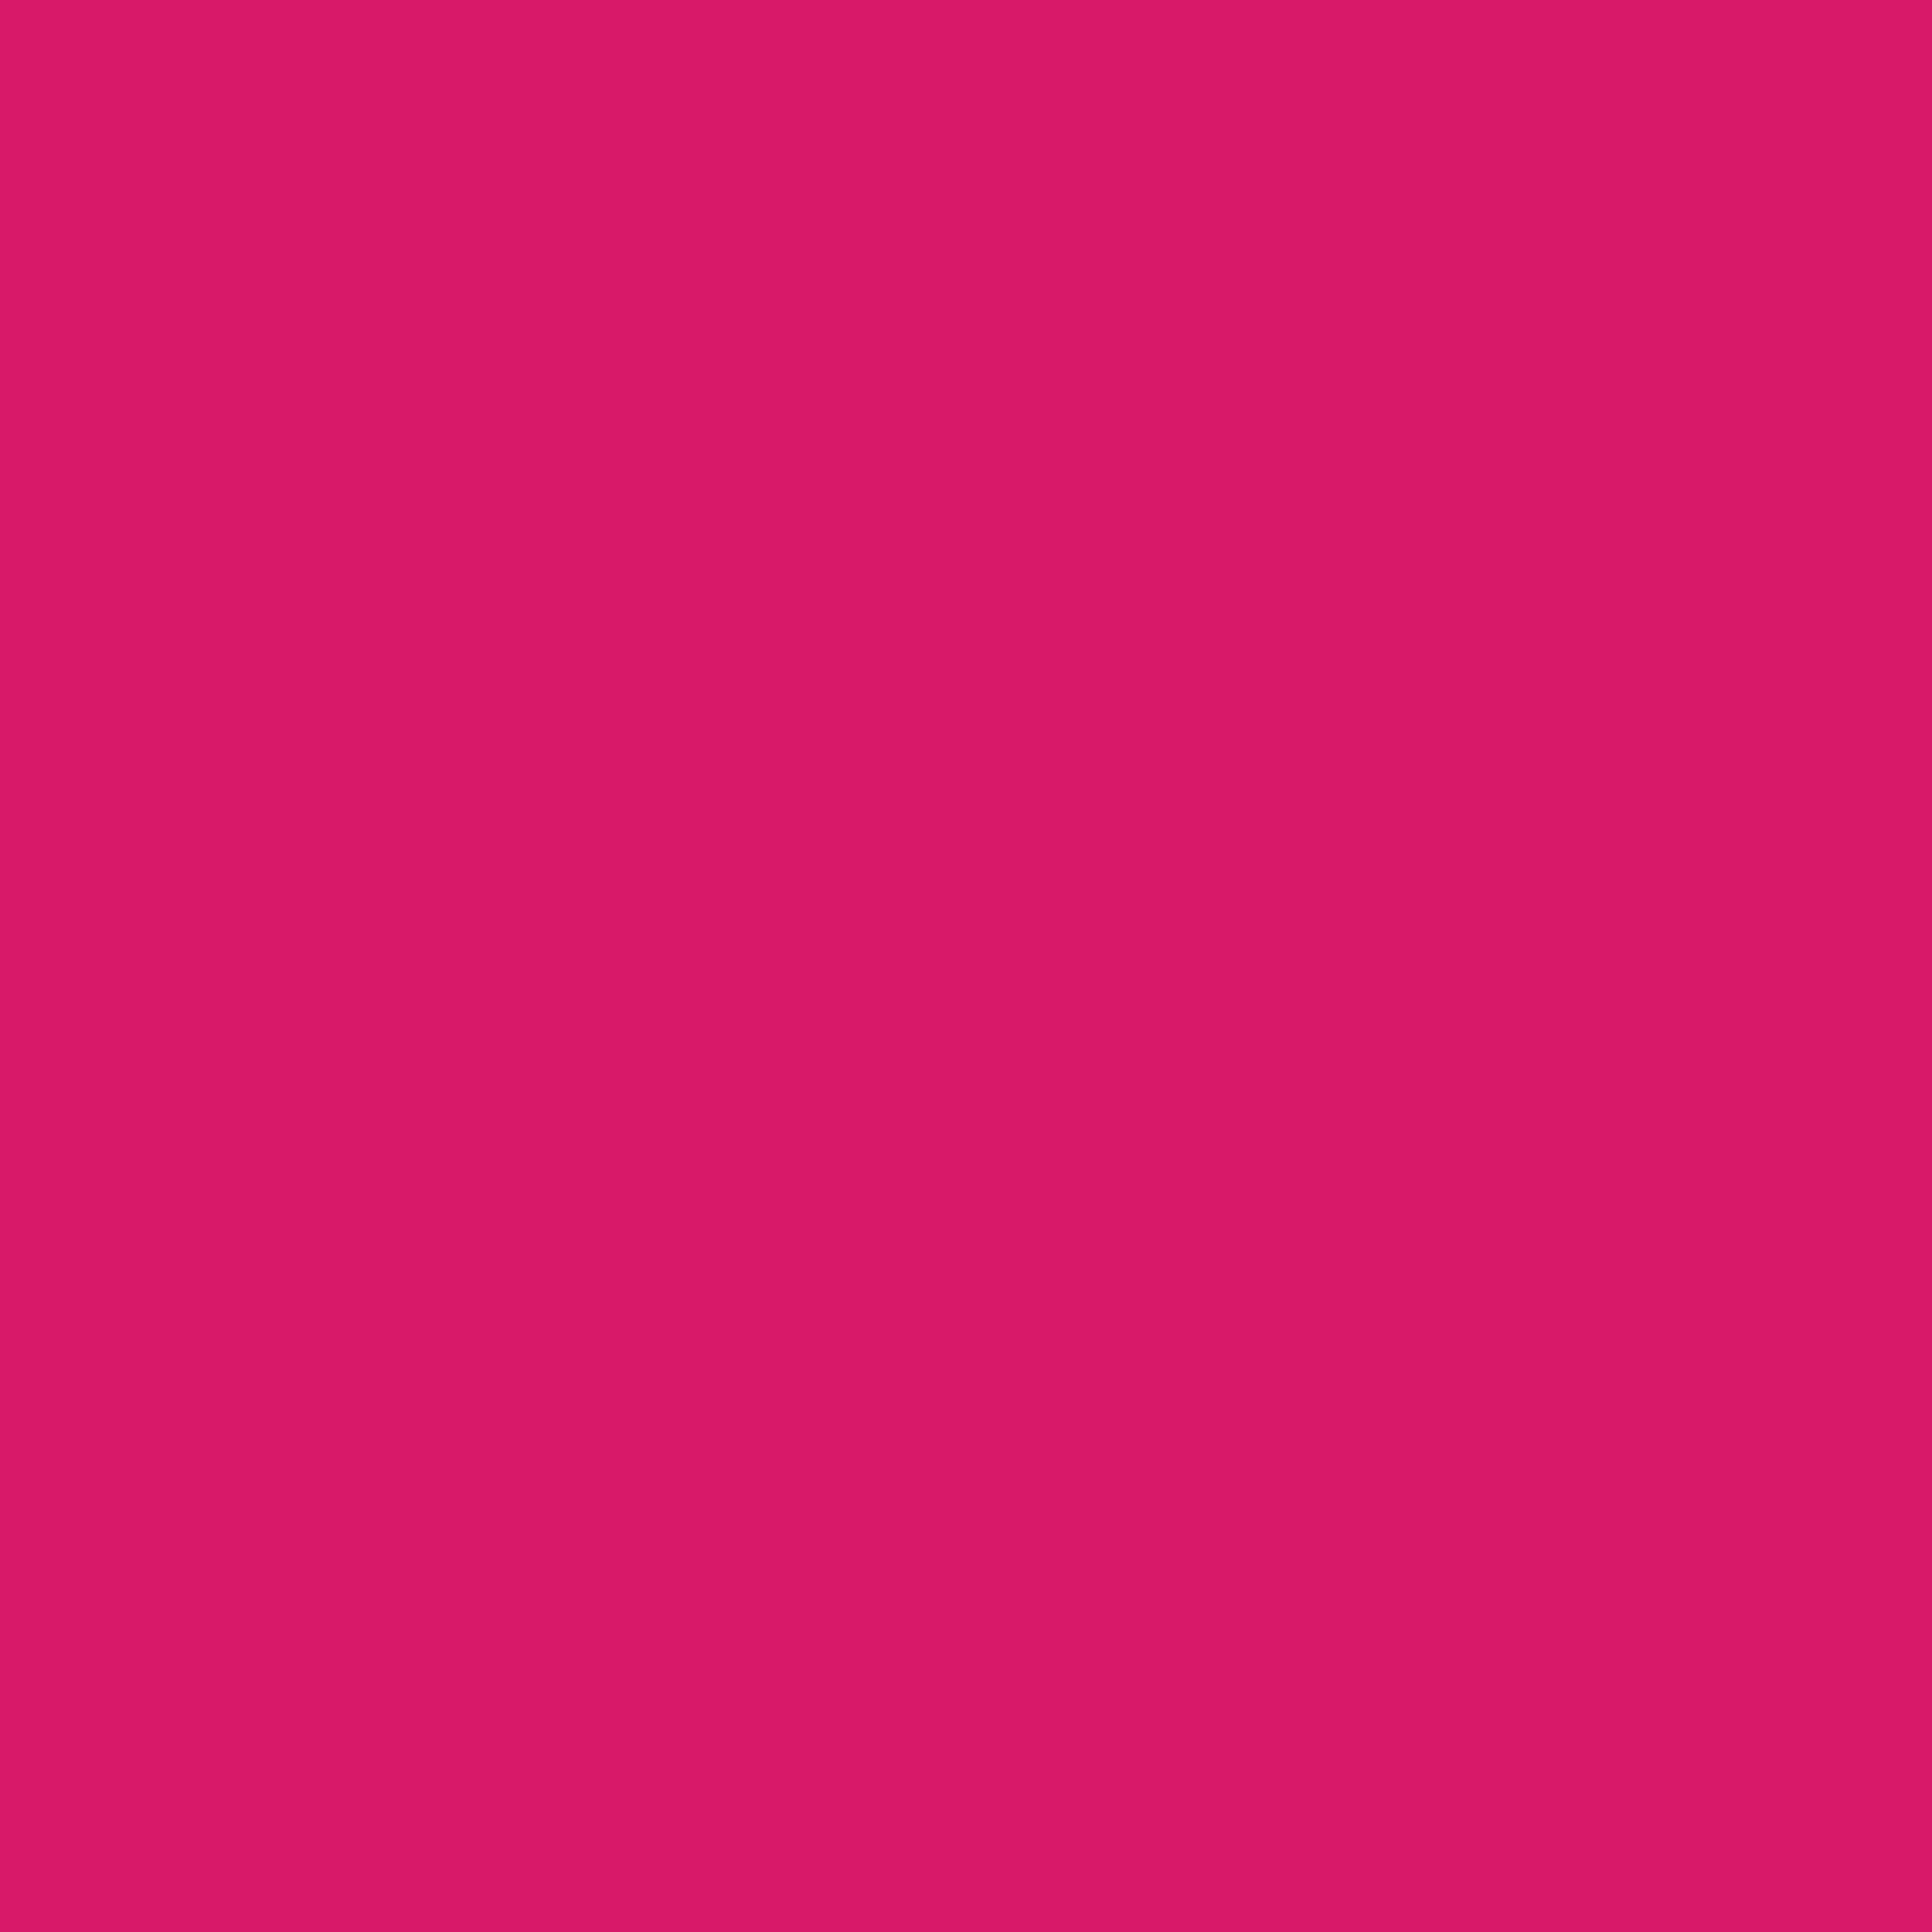 3600x3600 Dogwood Rose Solid Color Background